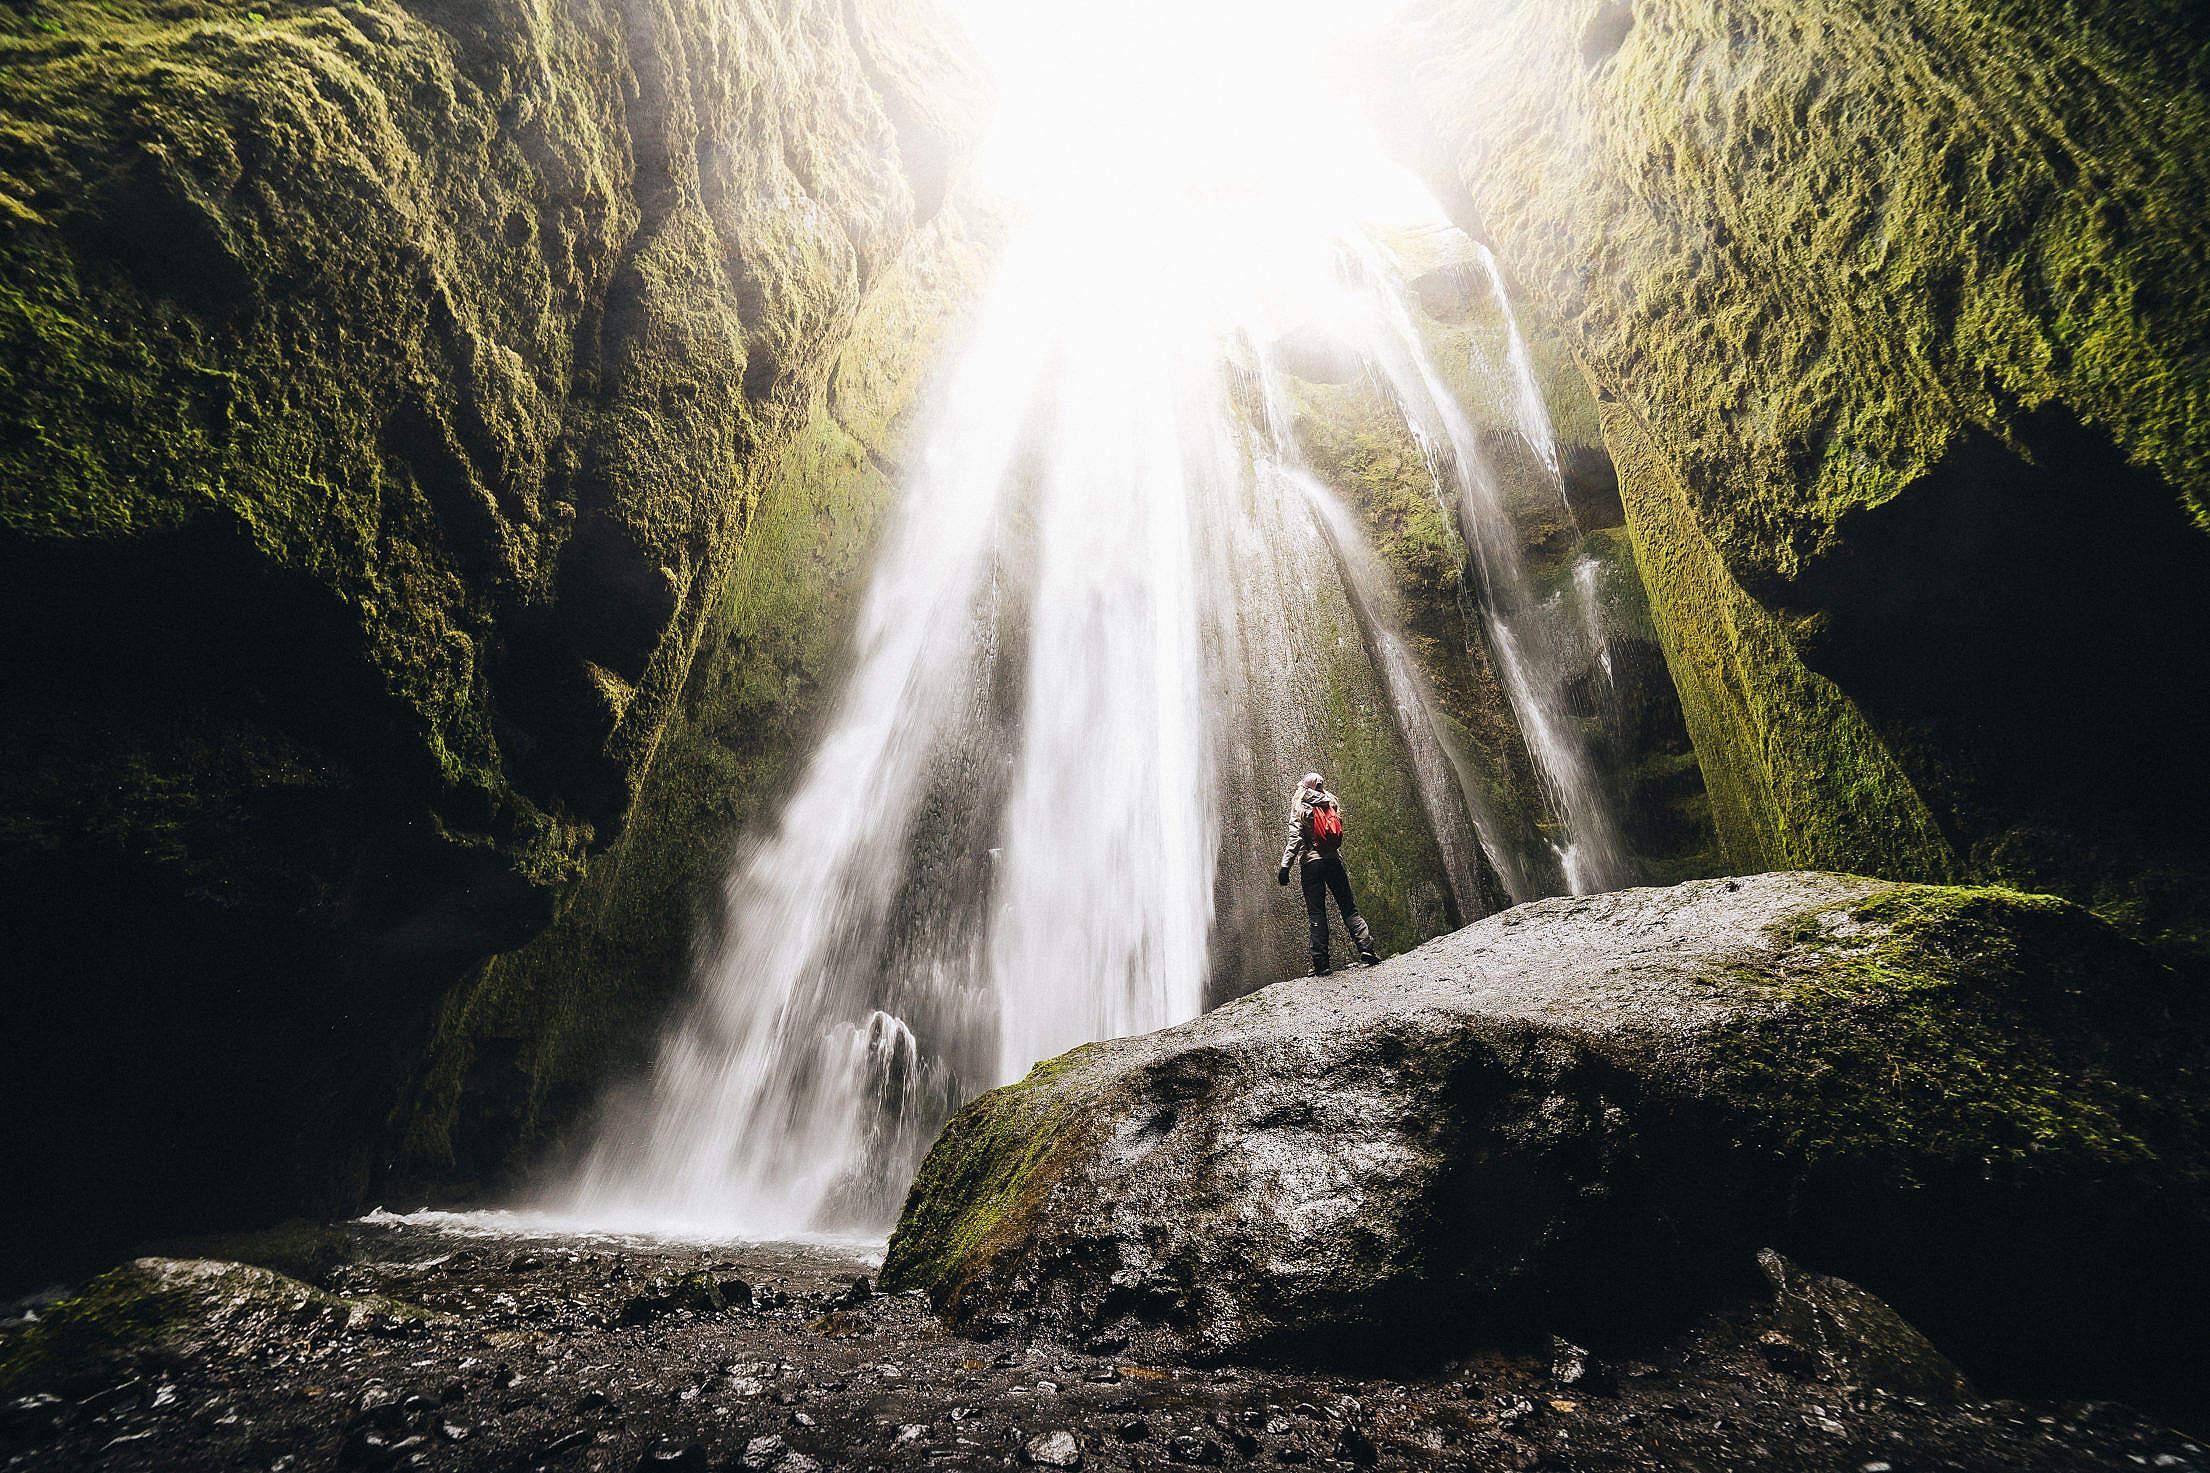 Woman Looking Up at Gljúfrabúi Waterfall Free Stock Photo